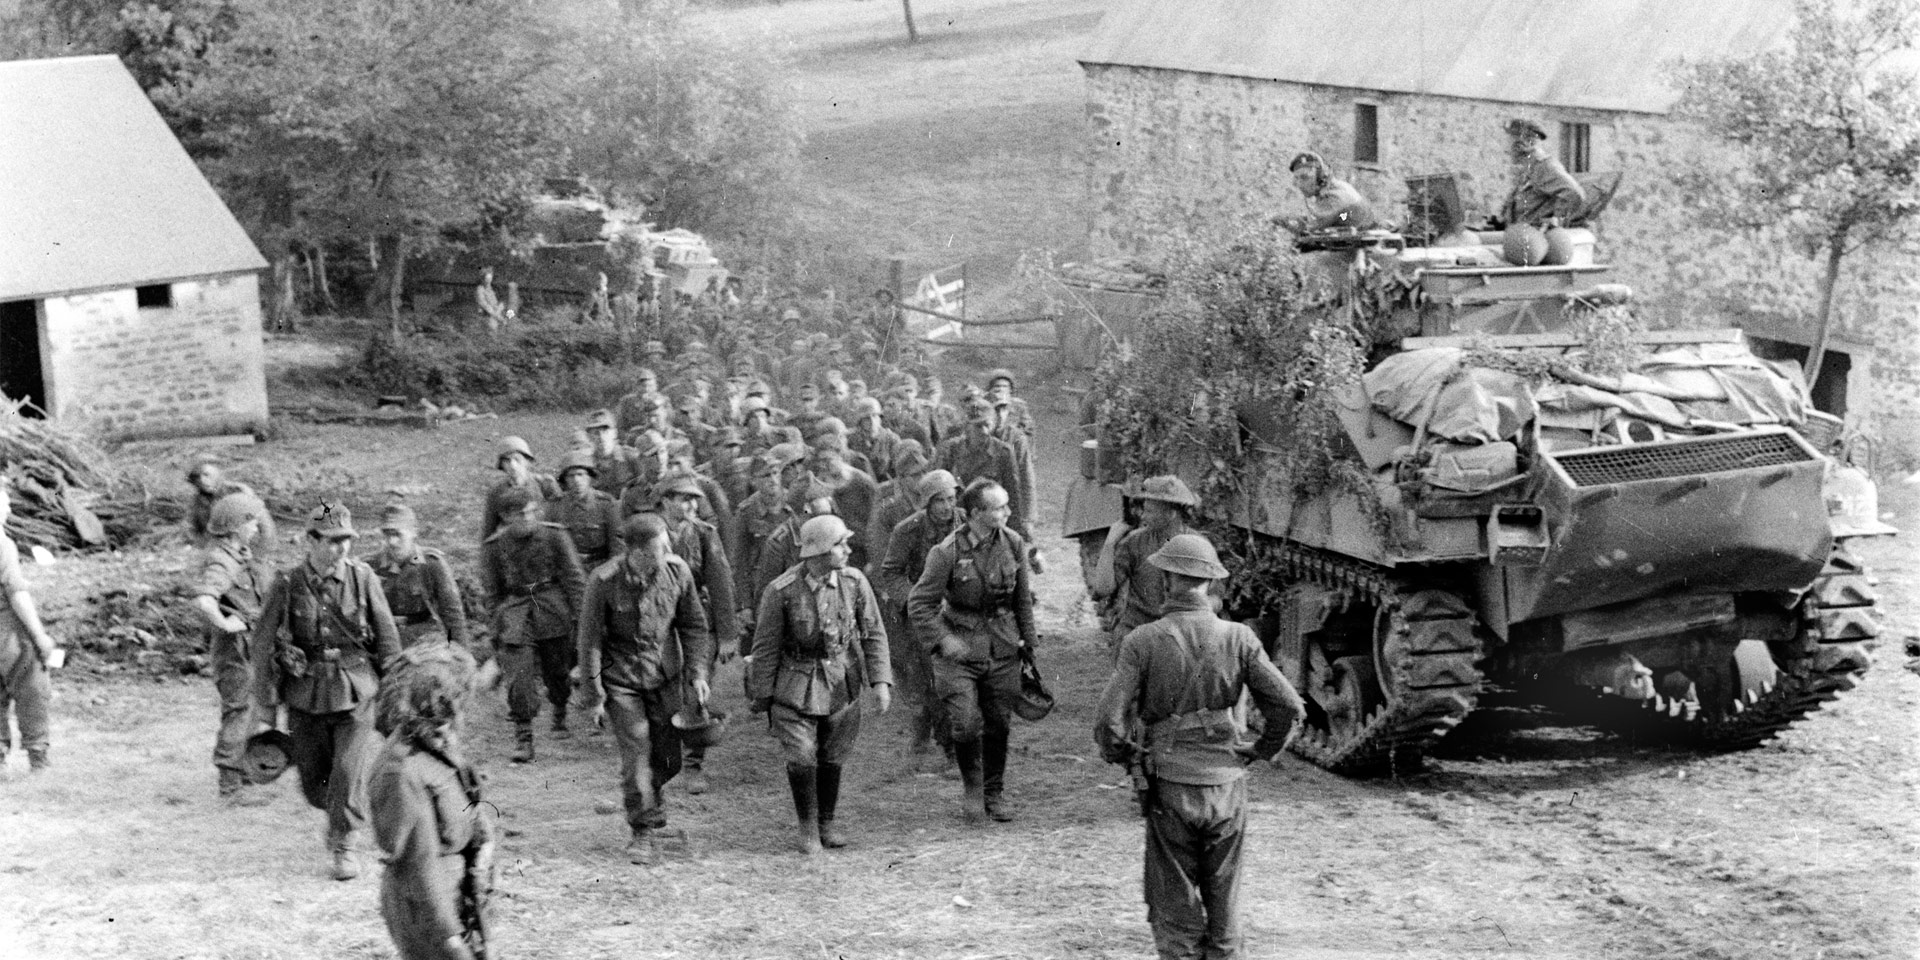 German prisoners marching past a Sherman tank, Normandy, 1944